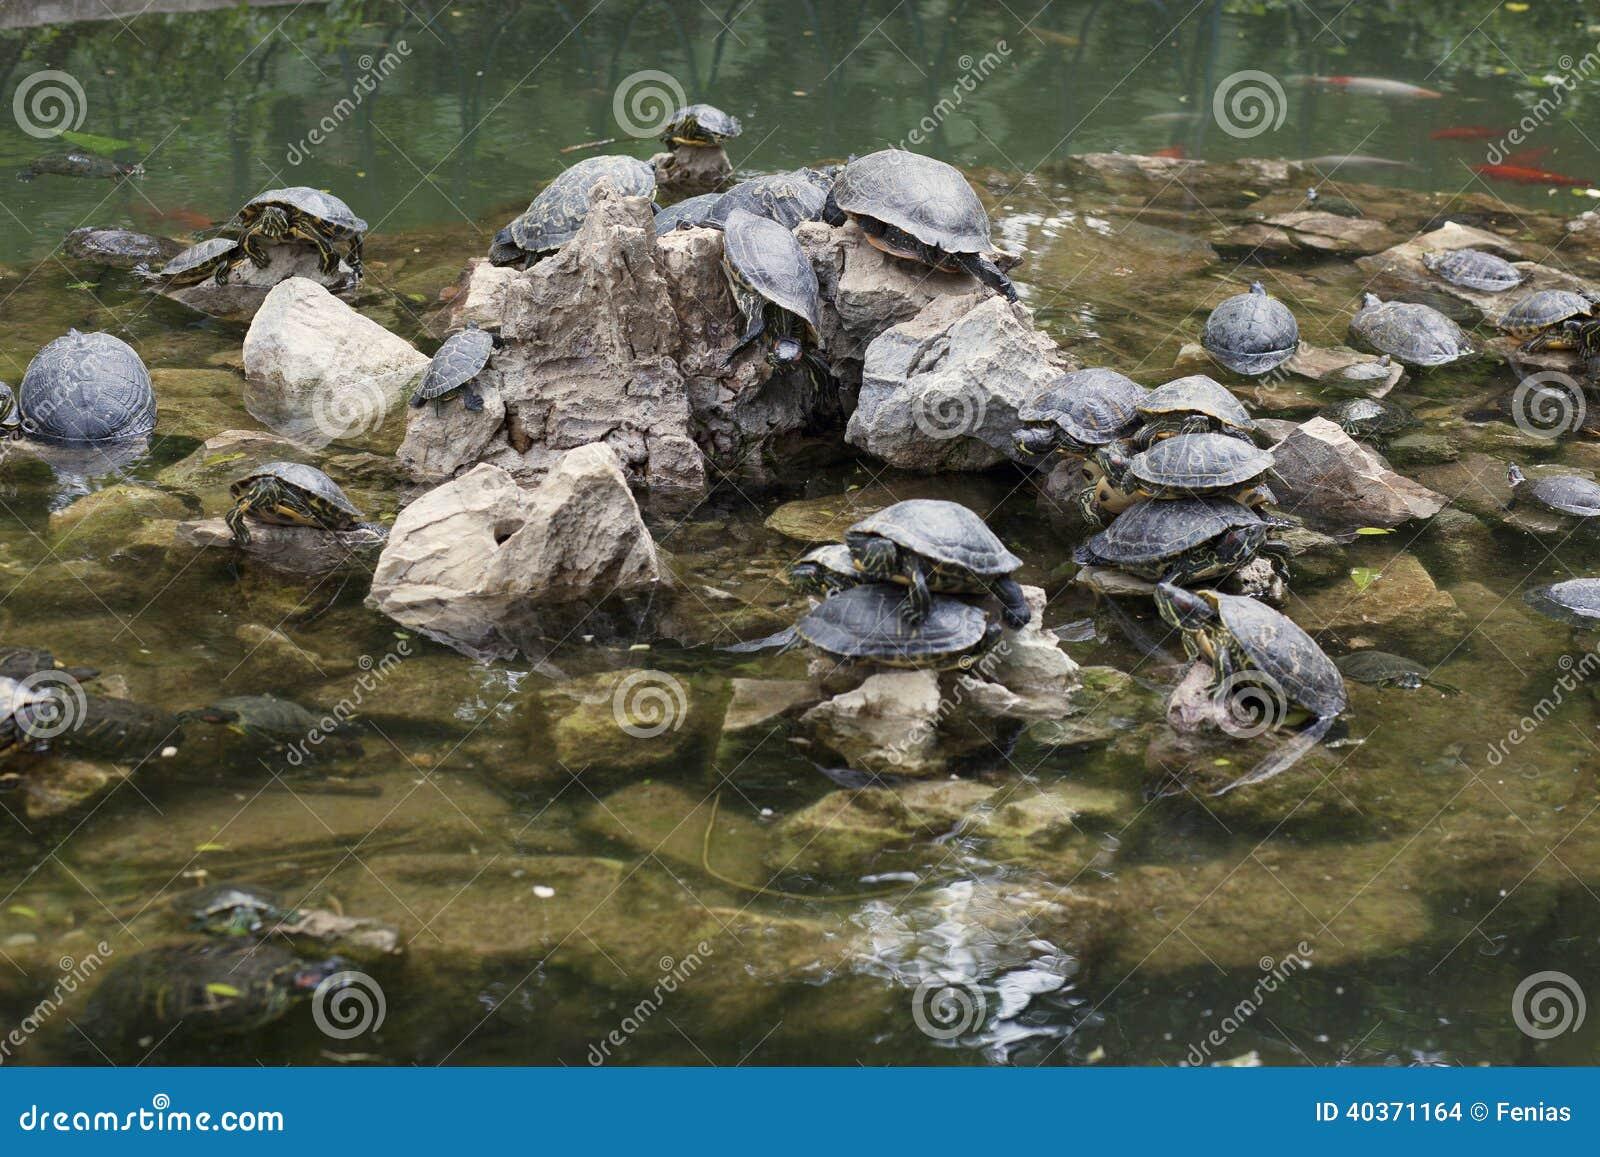 Water Turtles Stock Photo - Image: 40371164